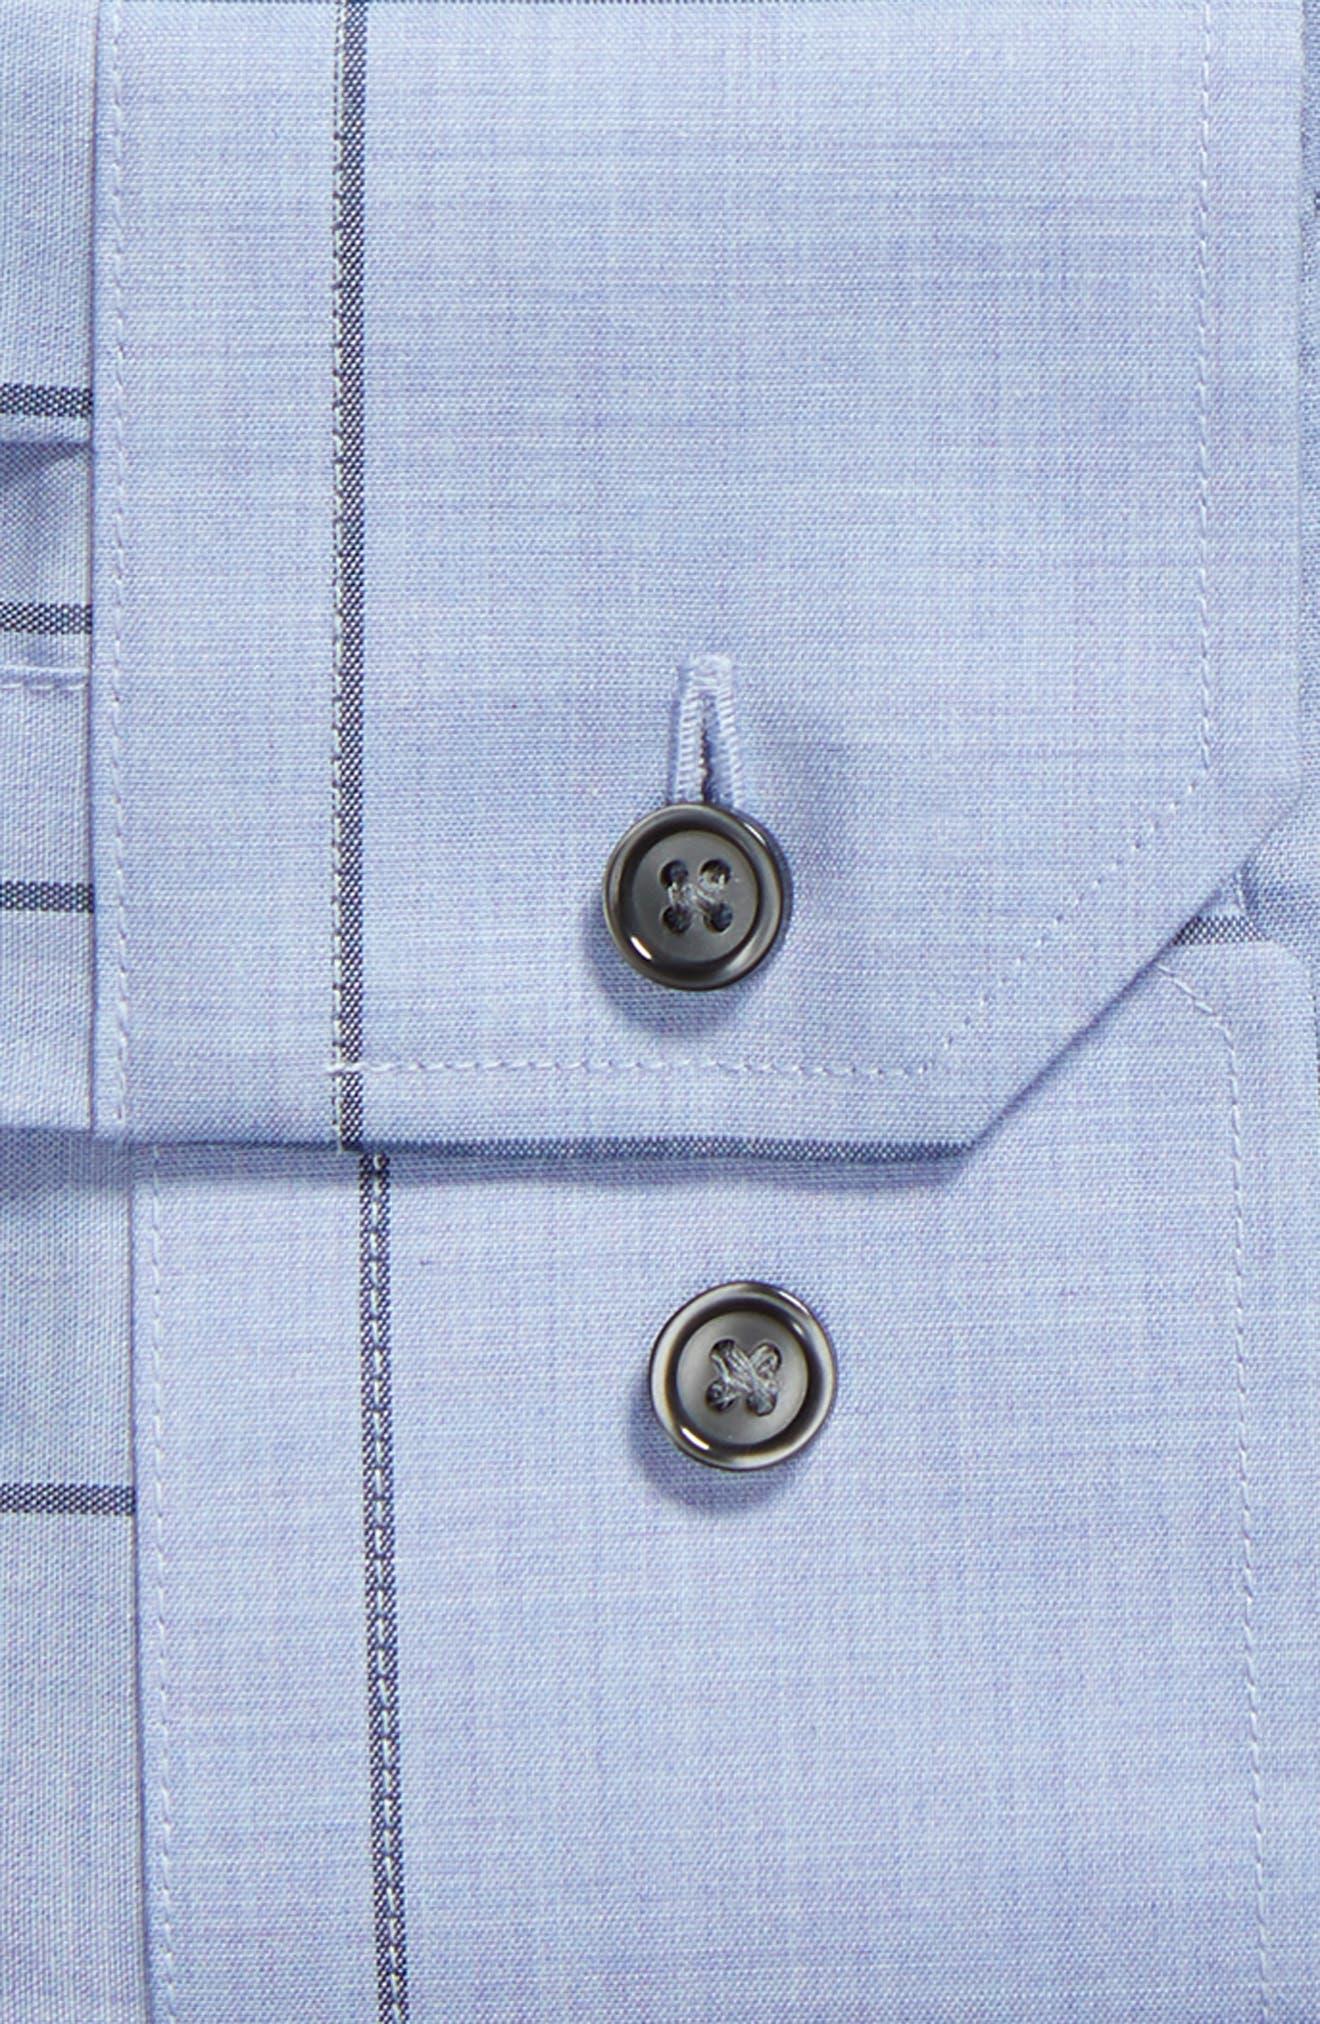 Trim Fit Non-Iron Windowpane Dress Shirt,                             Alternate thumbnail 6, color,                             BLUE HAZE